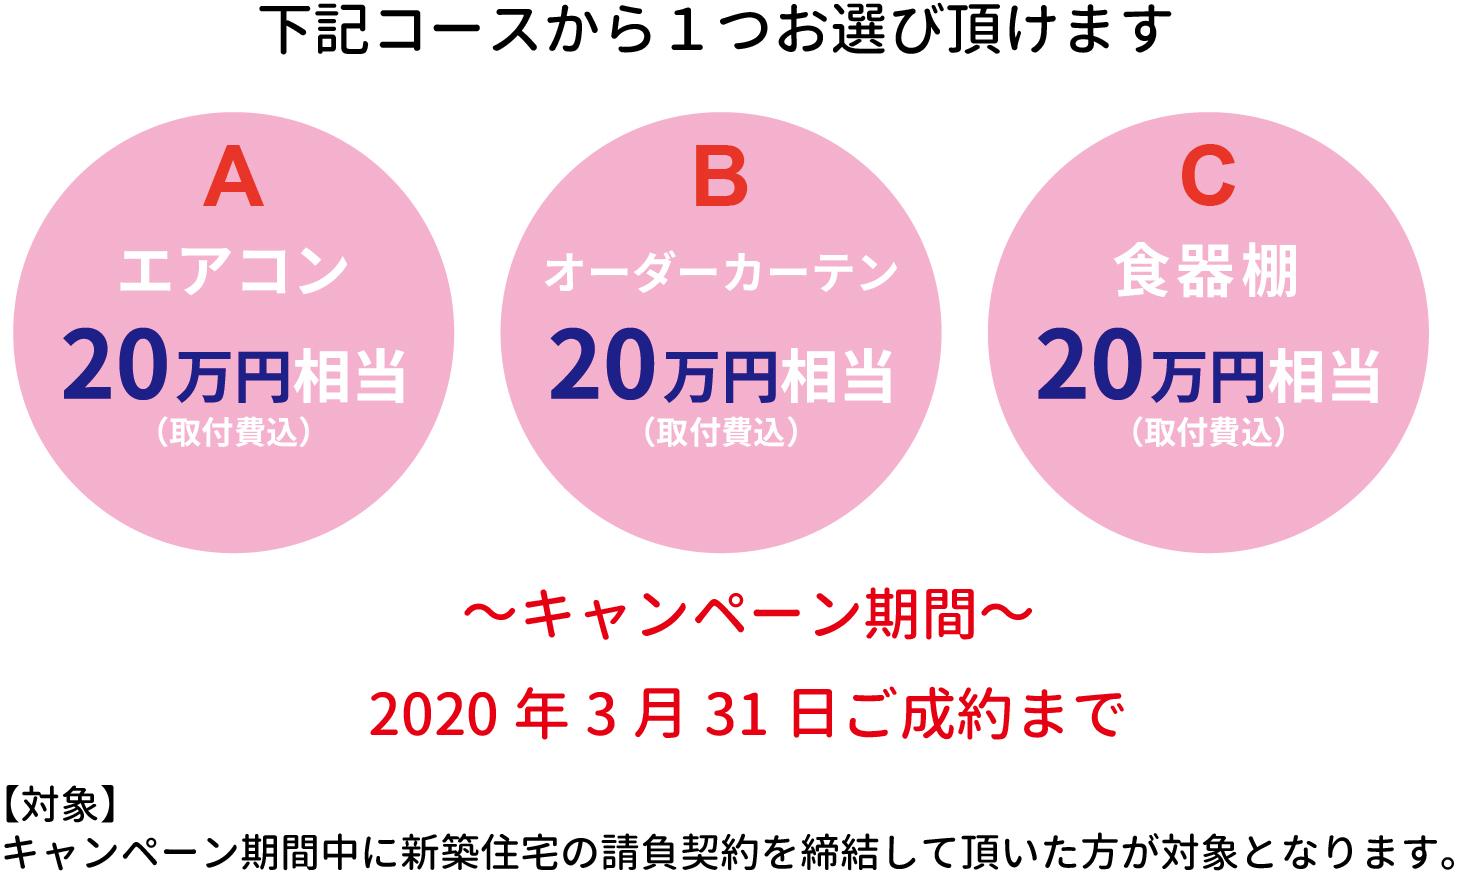 Aエアコン20万円相当 Bオーダーカーテン20万円相当 C食器棚20万円相当